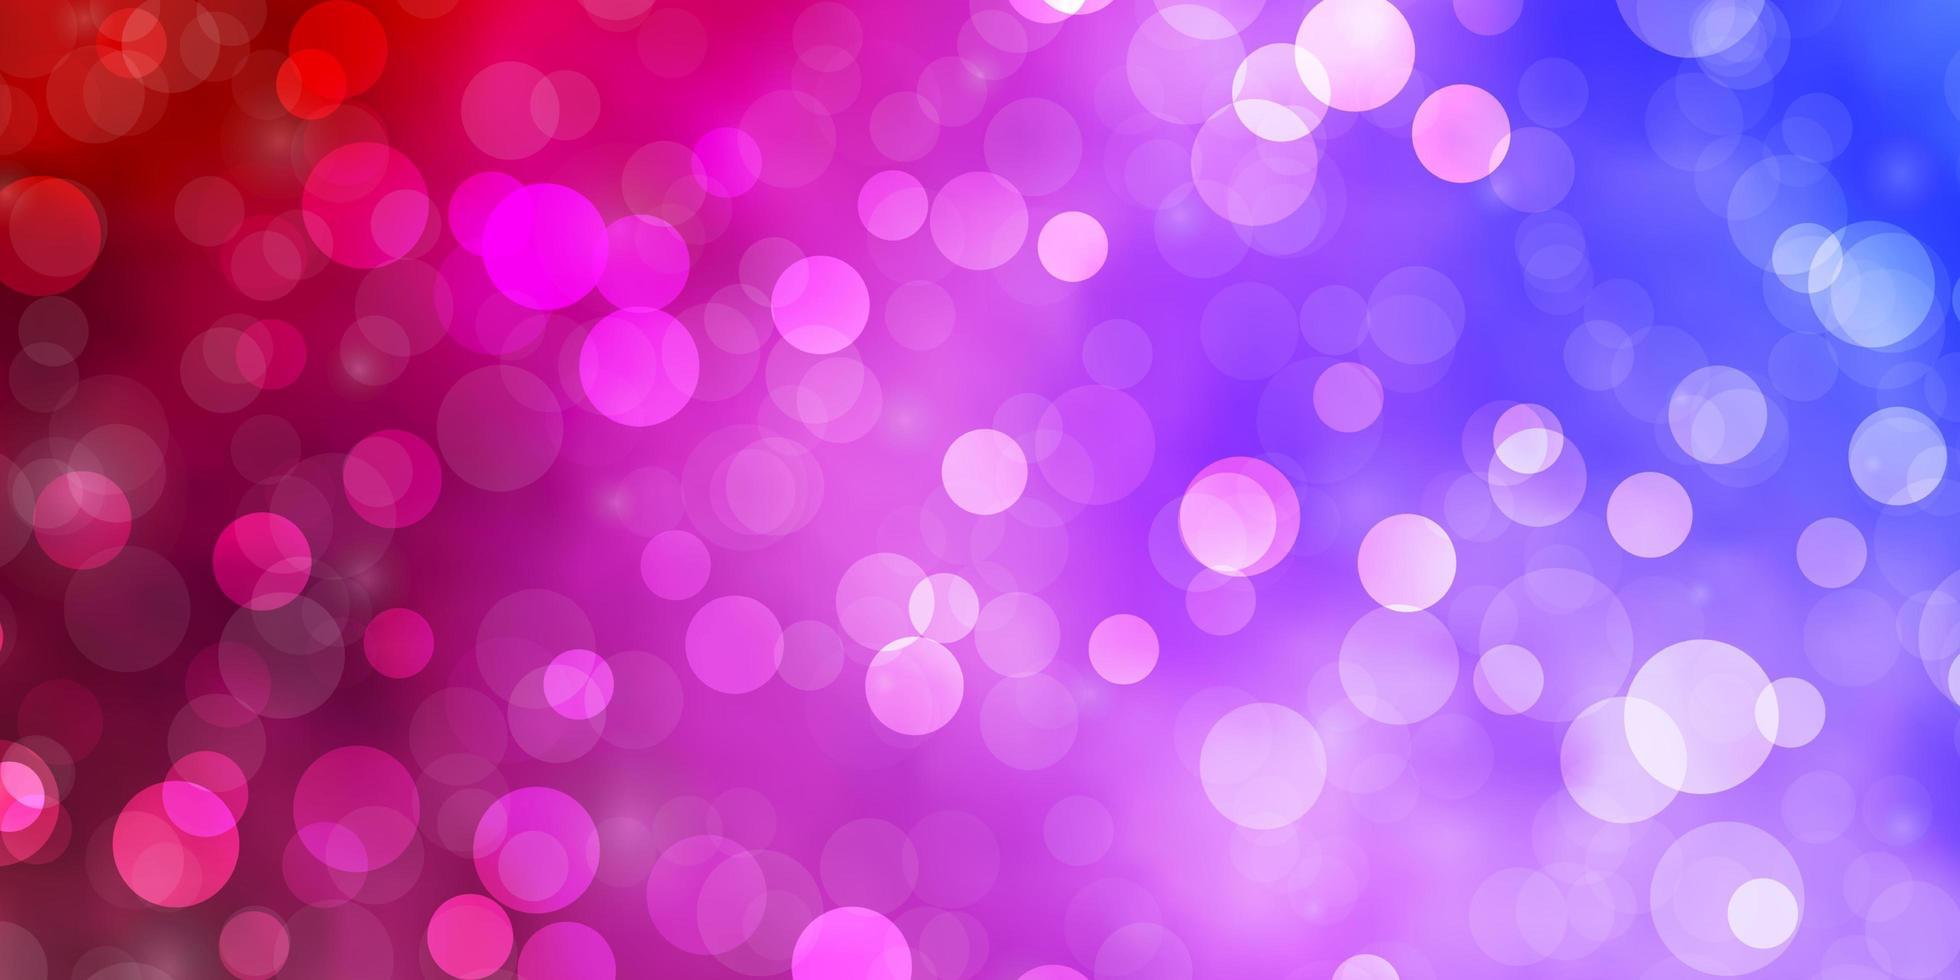 hellblaue, rosa Textur mit Kreisen. vektor